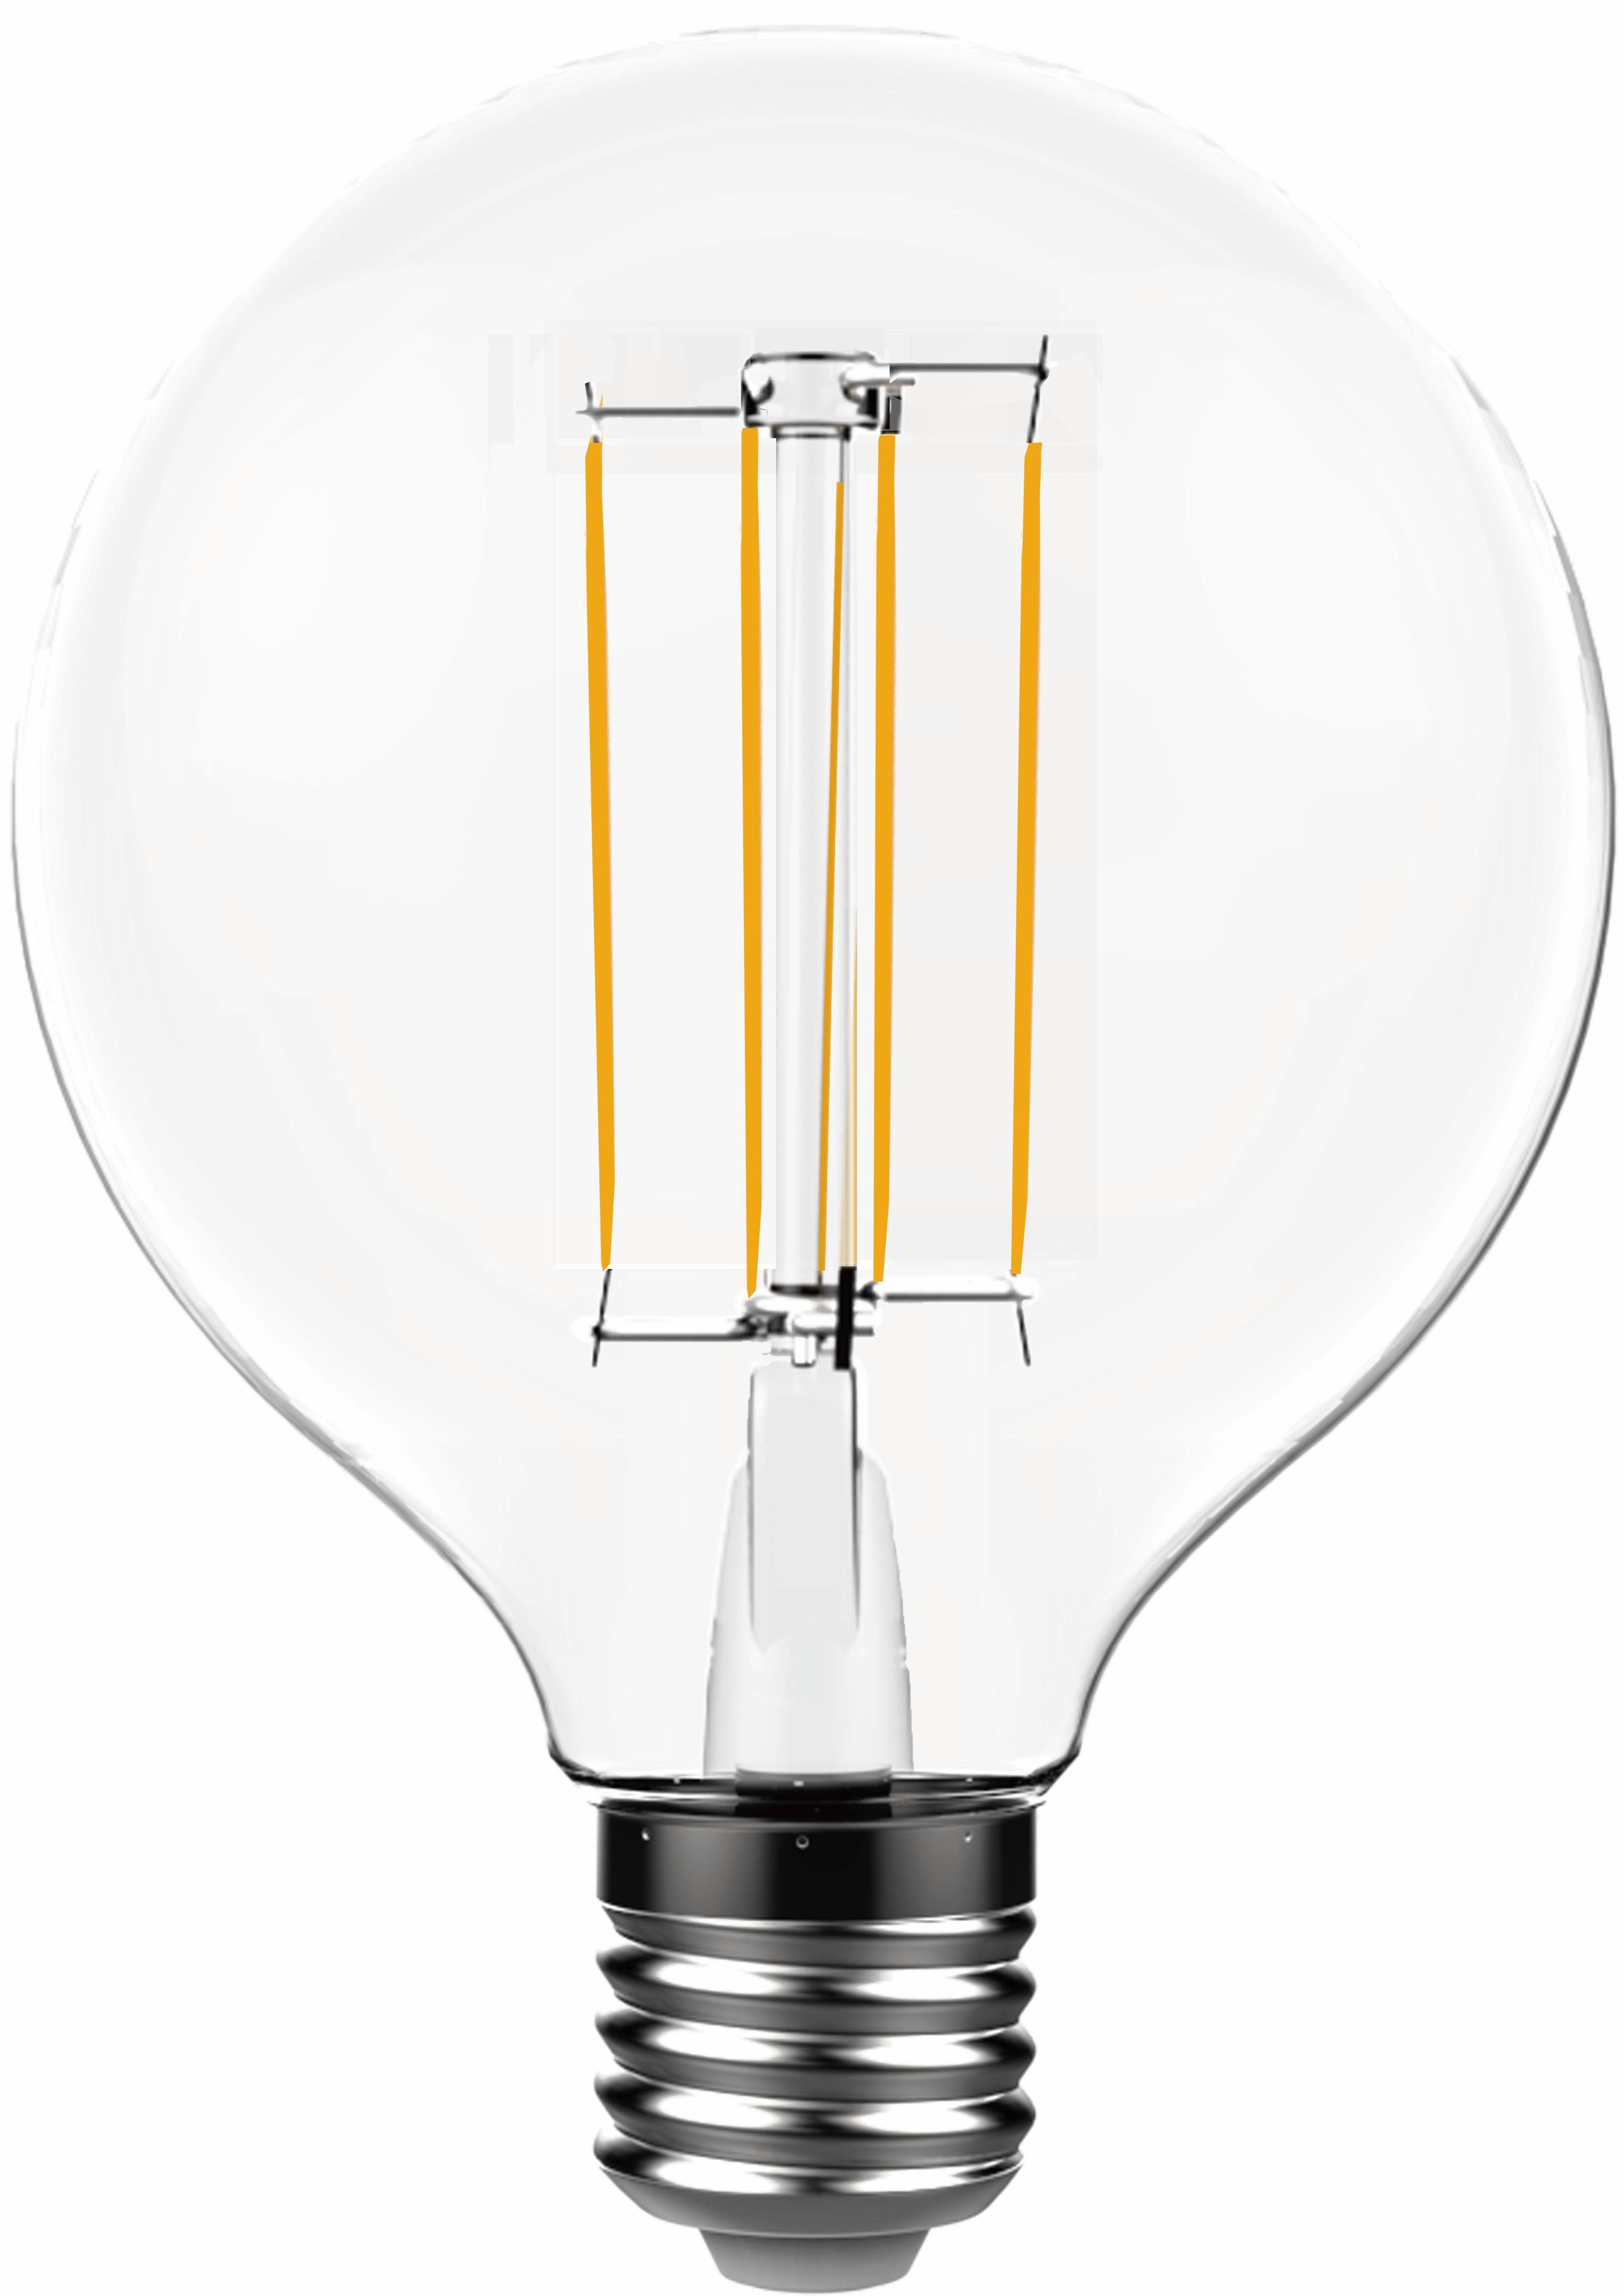 Toshiba »Kugel Globe« LED-Leuchtmittel, E27, 2 Stück, Warmweiß